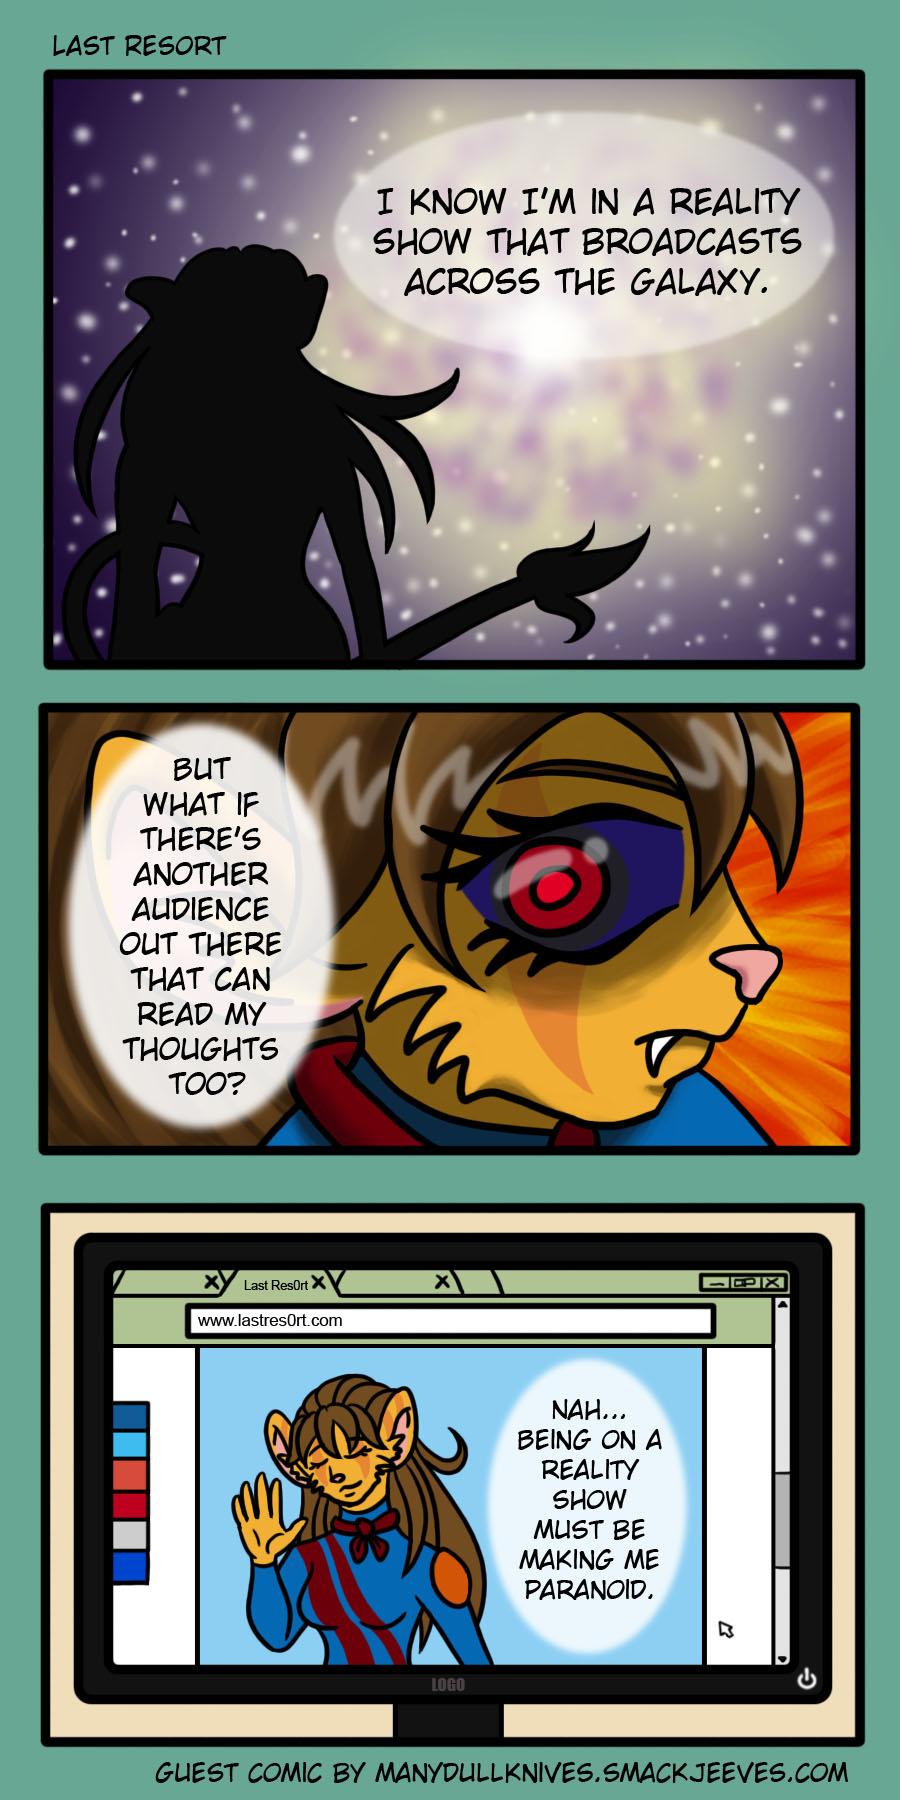 [GUEST COMIC] Comiception.